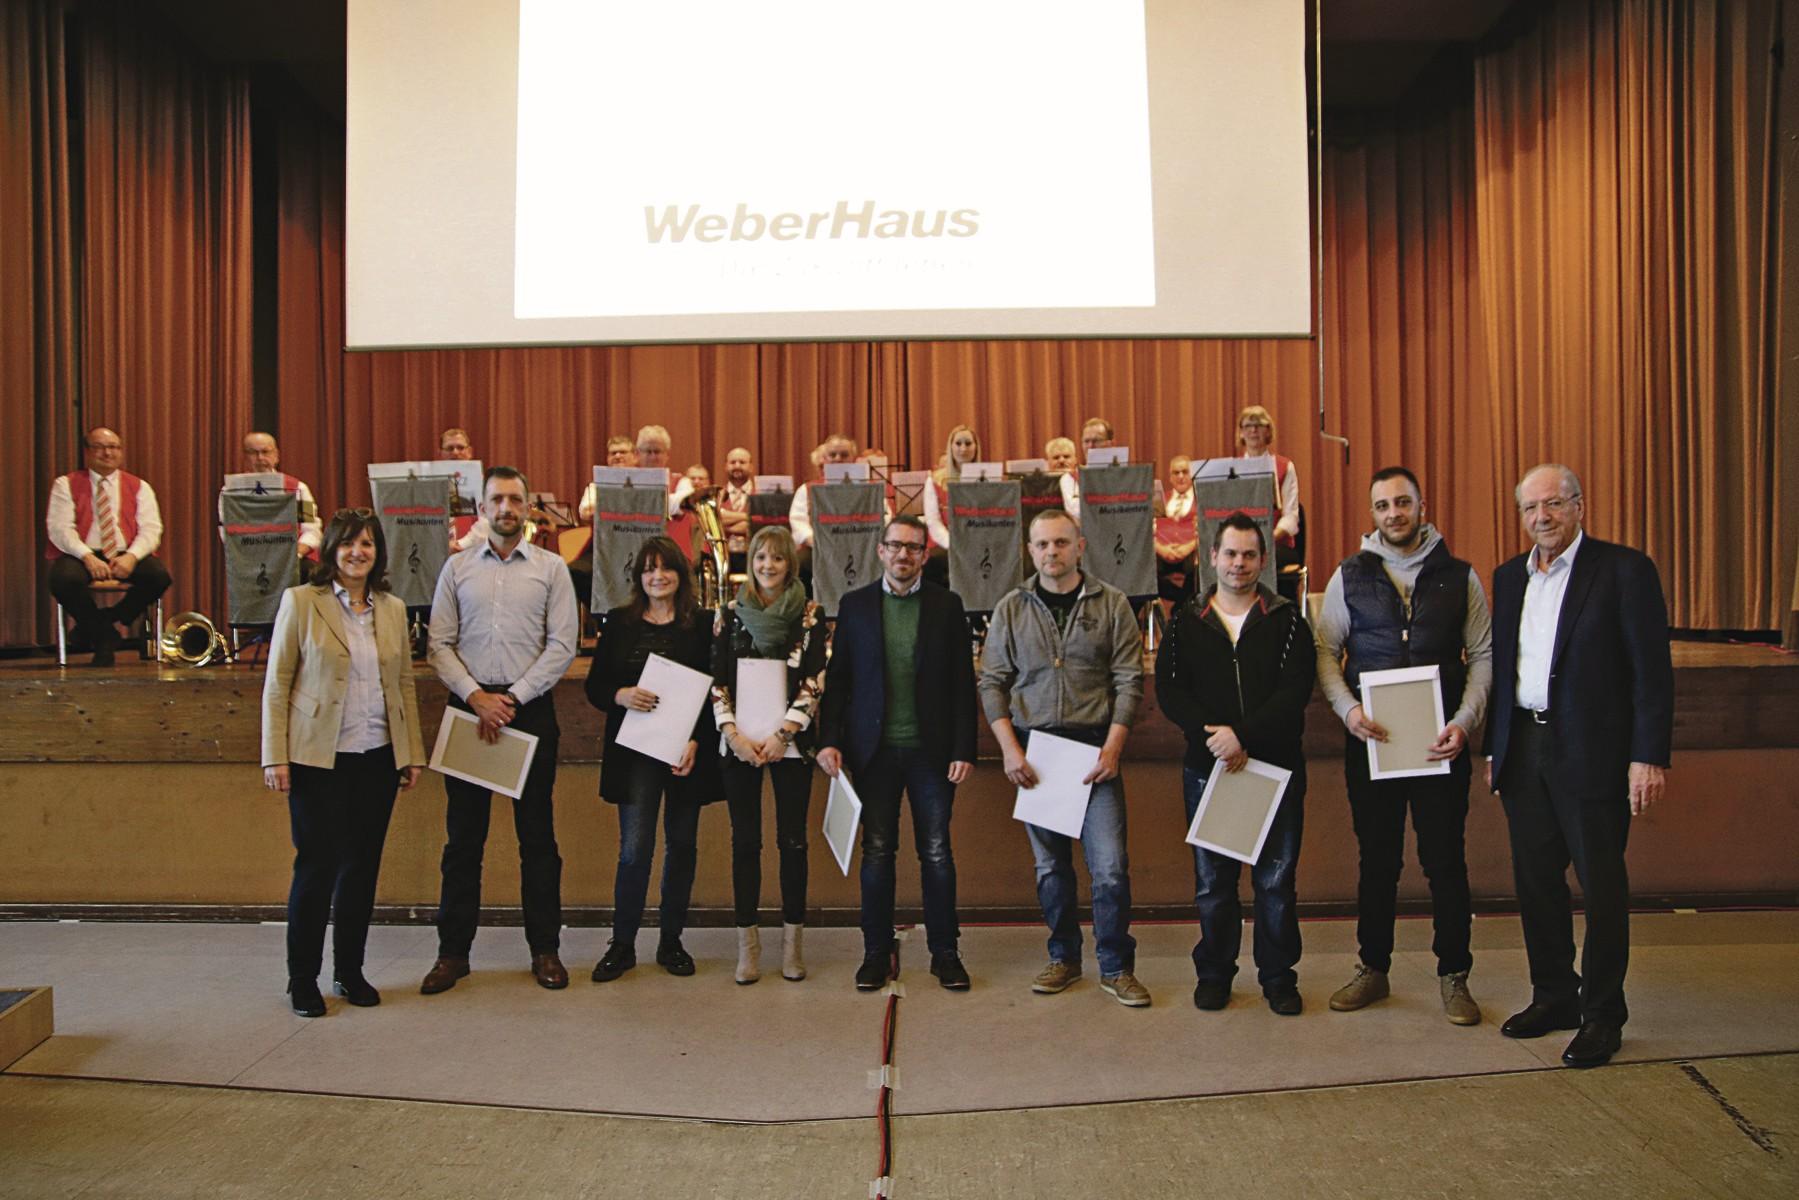 Betriebsversammlung in Rheinau-Linx